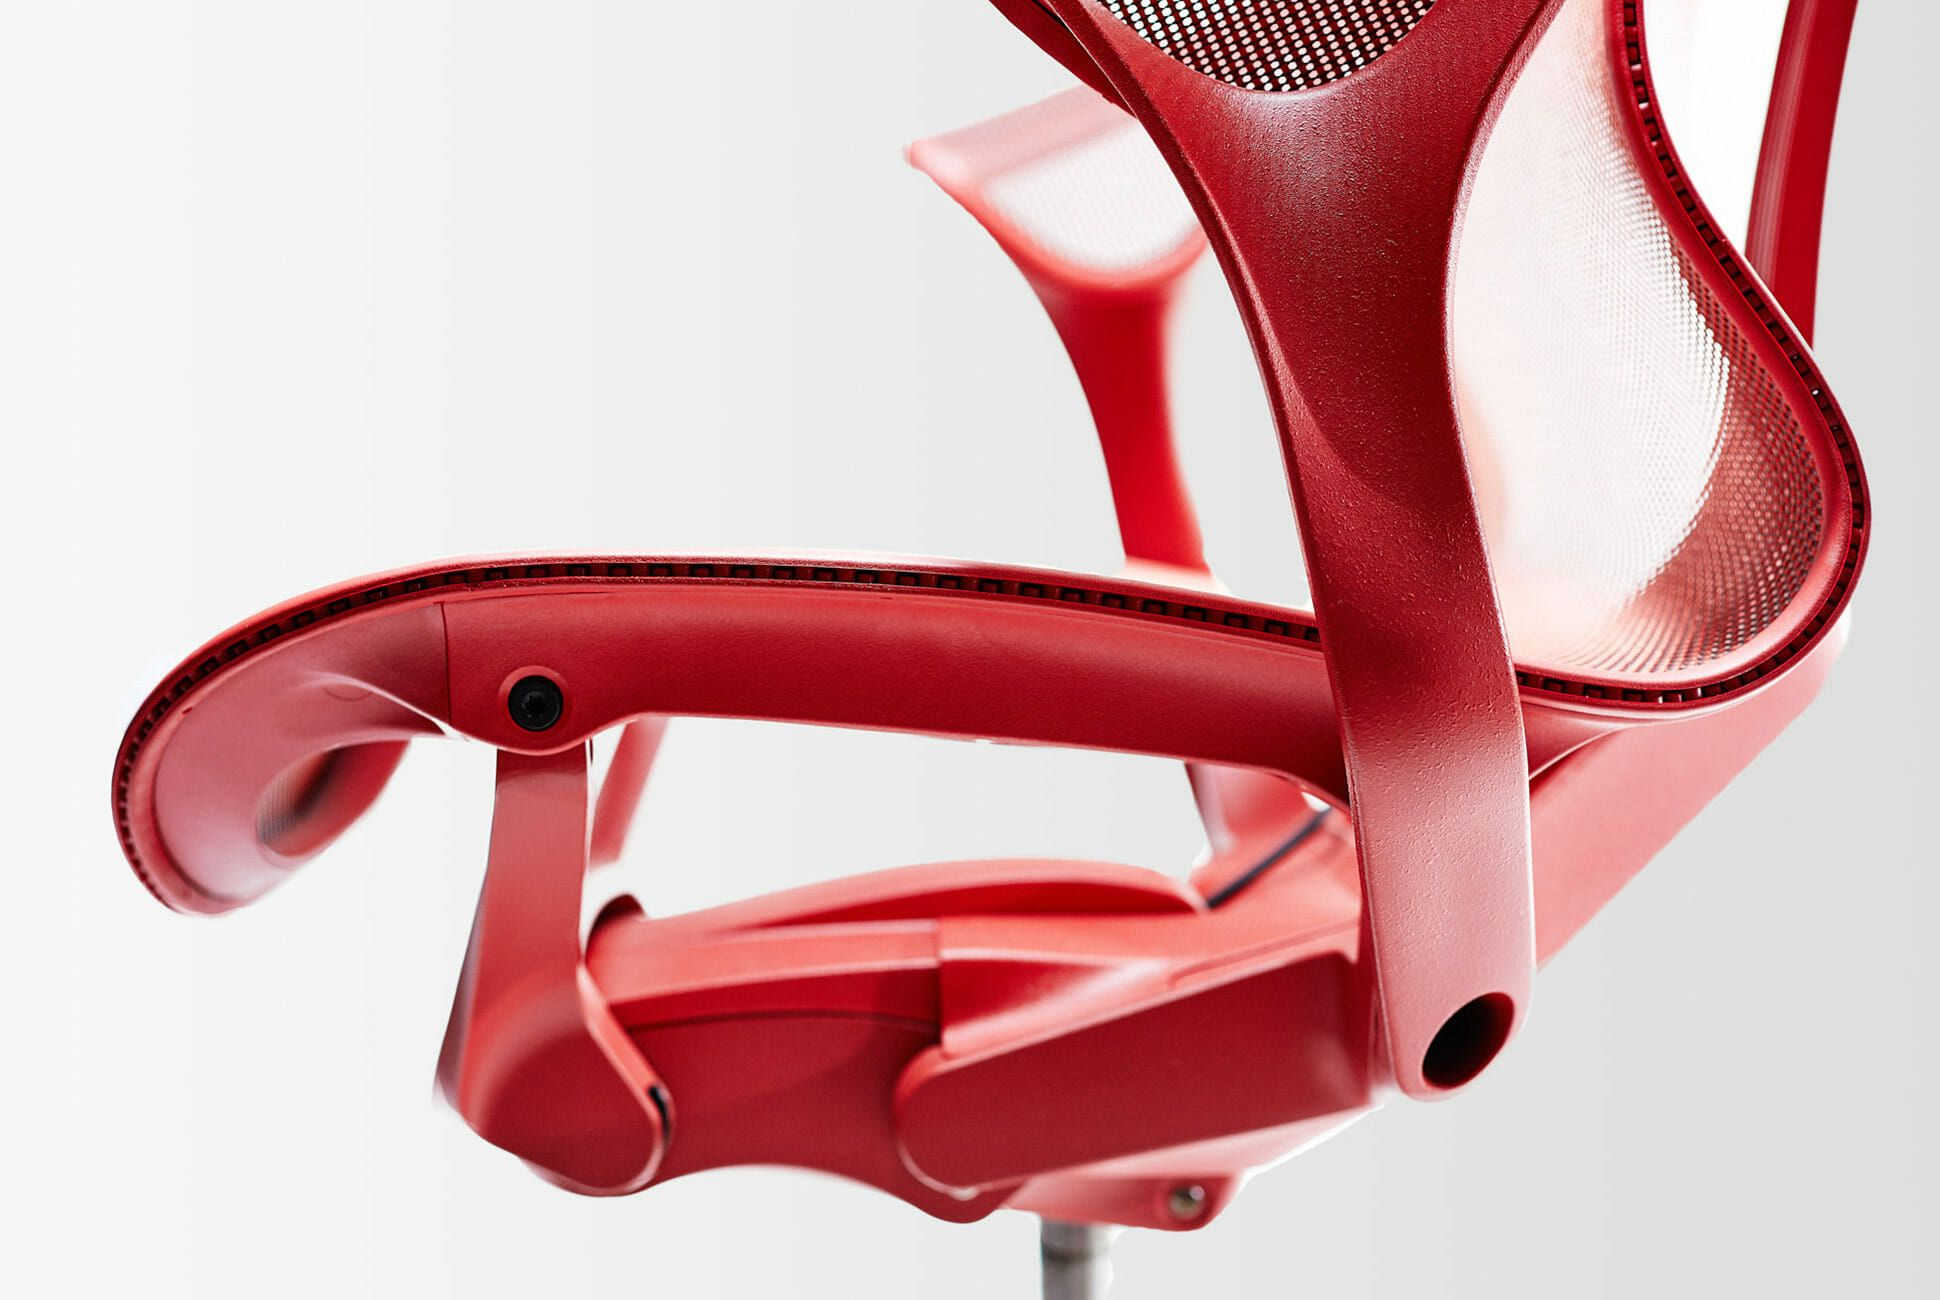 M2W-Cosm-Chair-Gear-Patrol-Slide-4